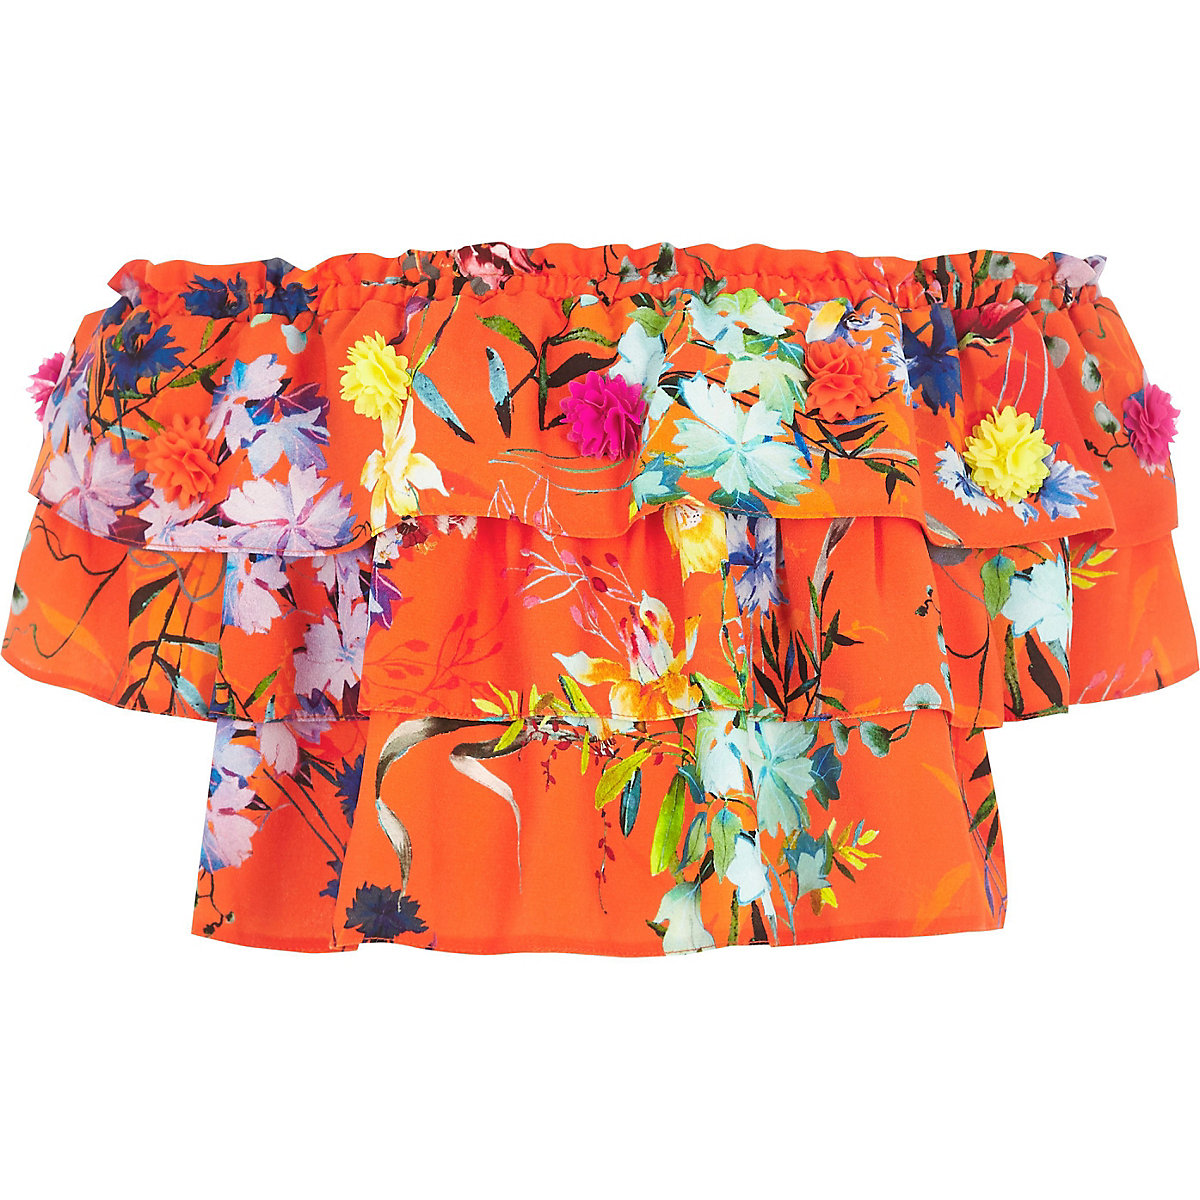 Girls orange RI Studio floral print frill top